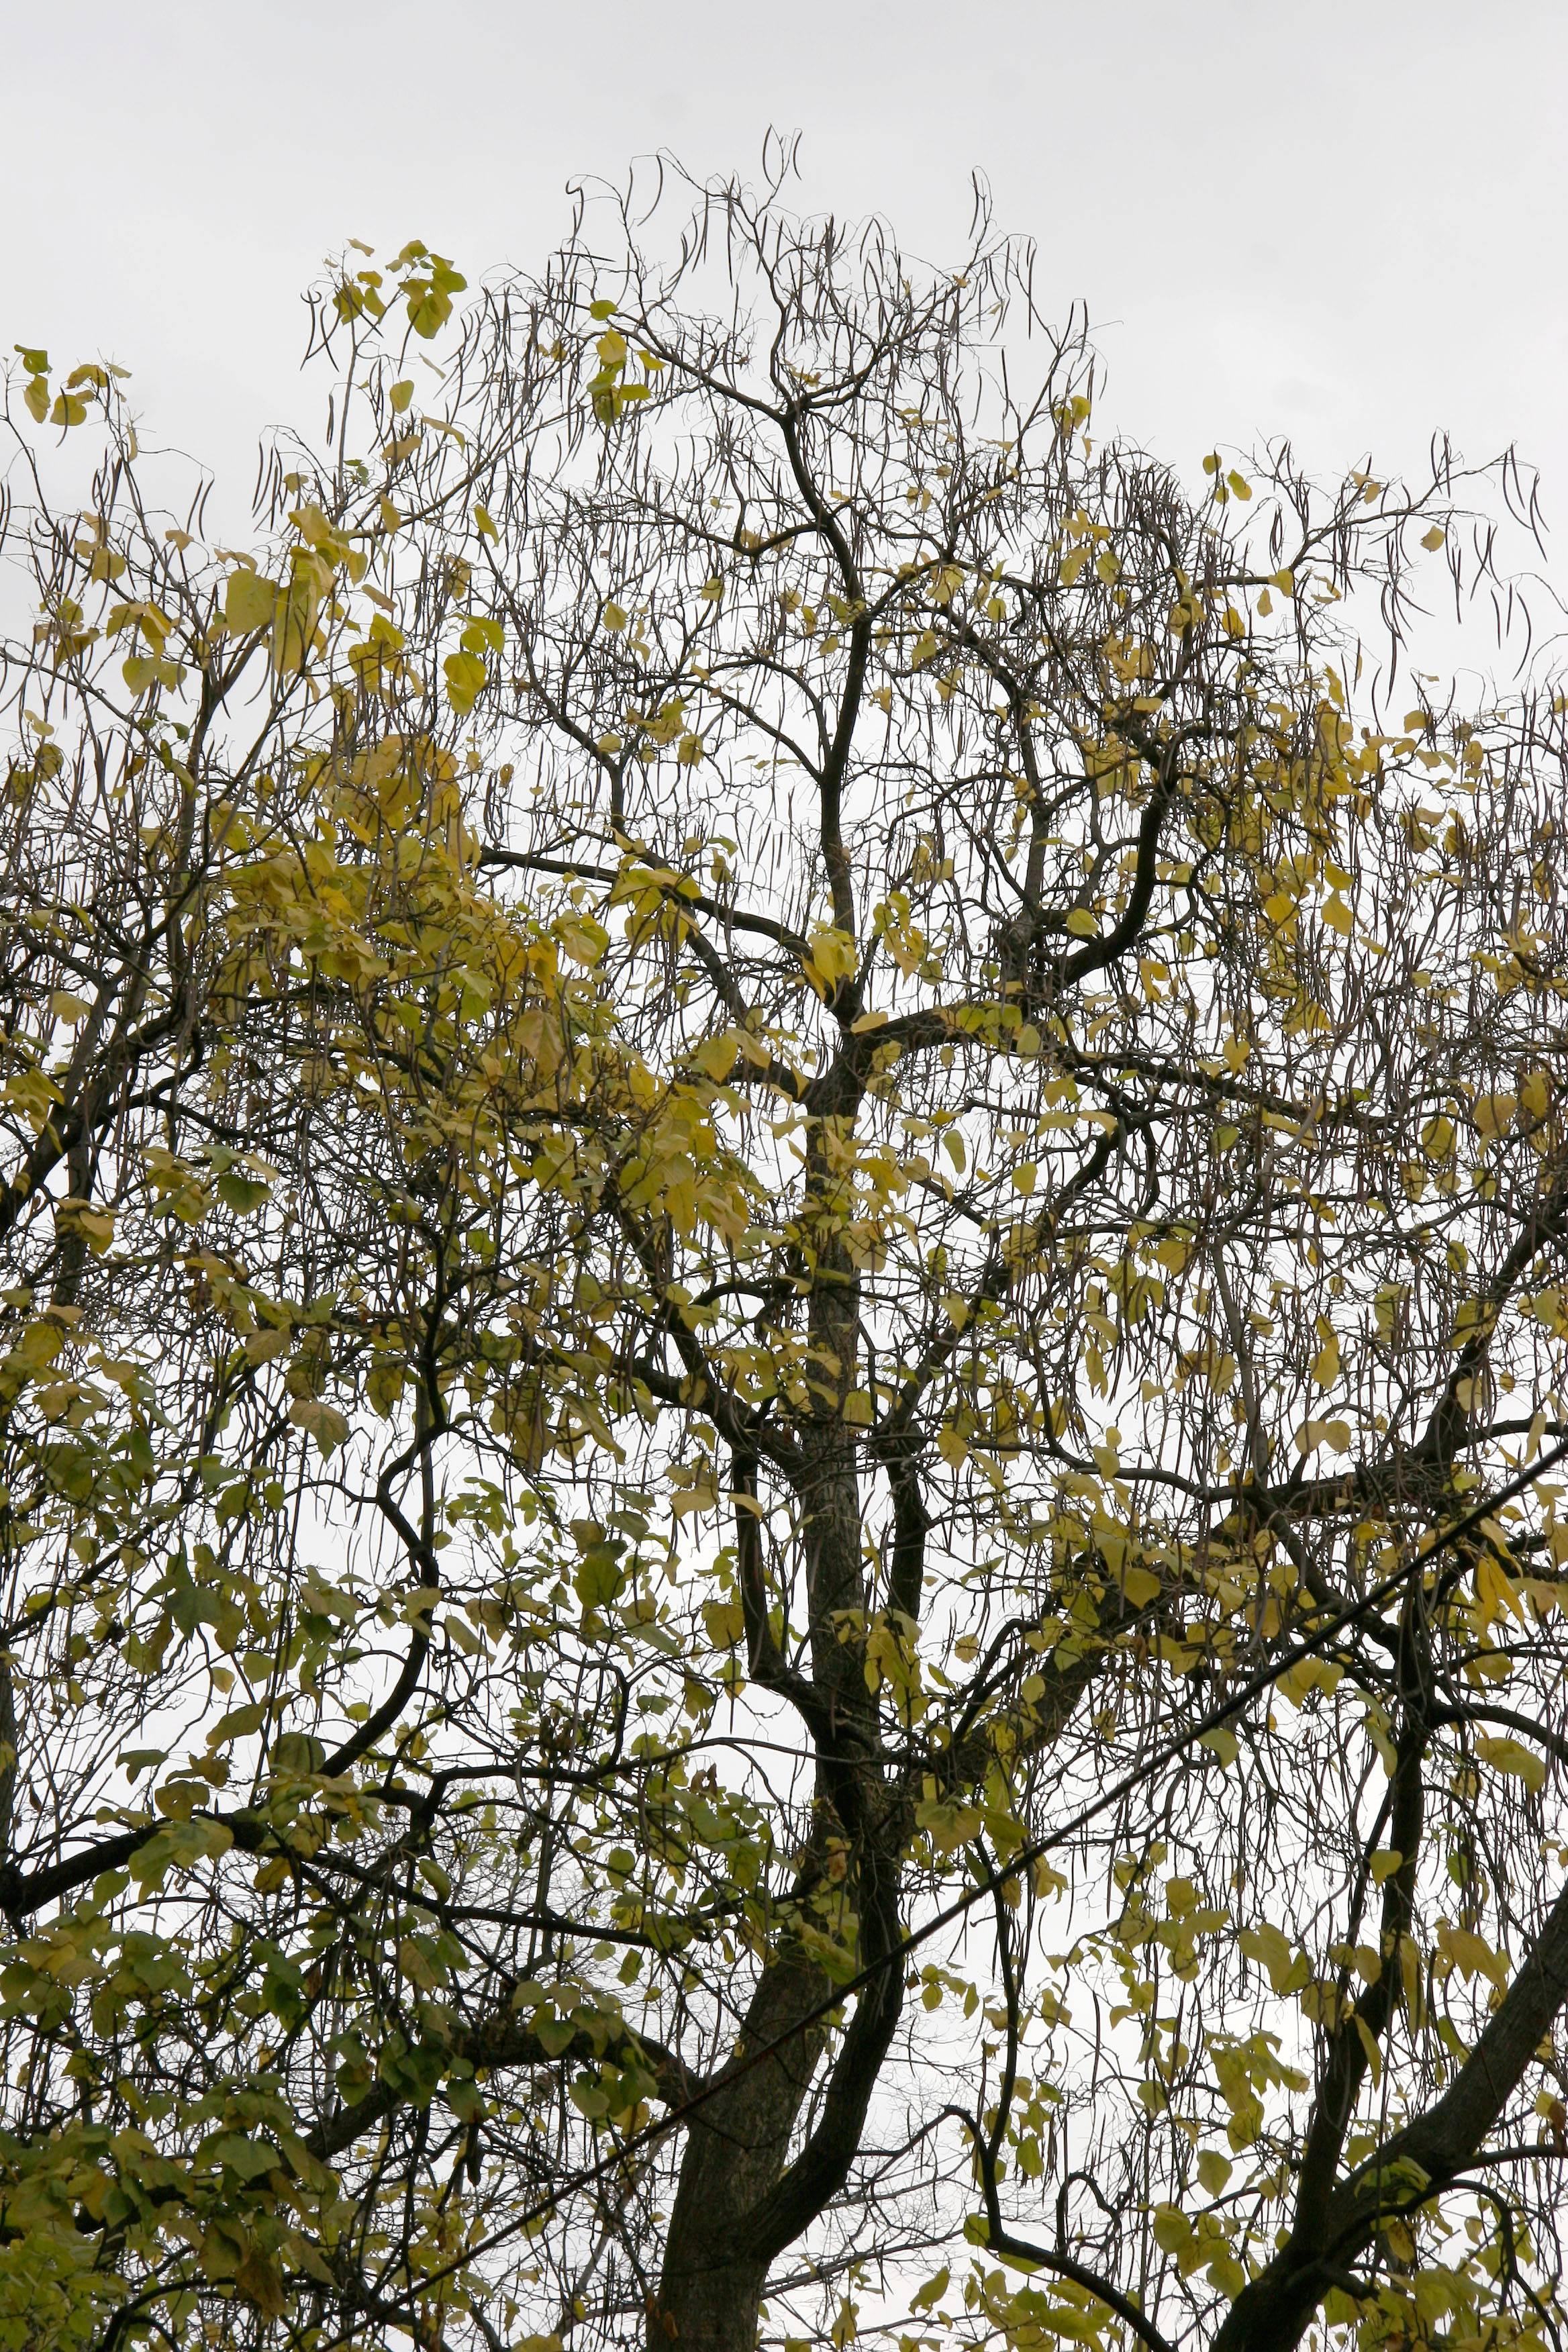 Catalpa Tree Chandelier & Foliage